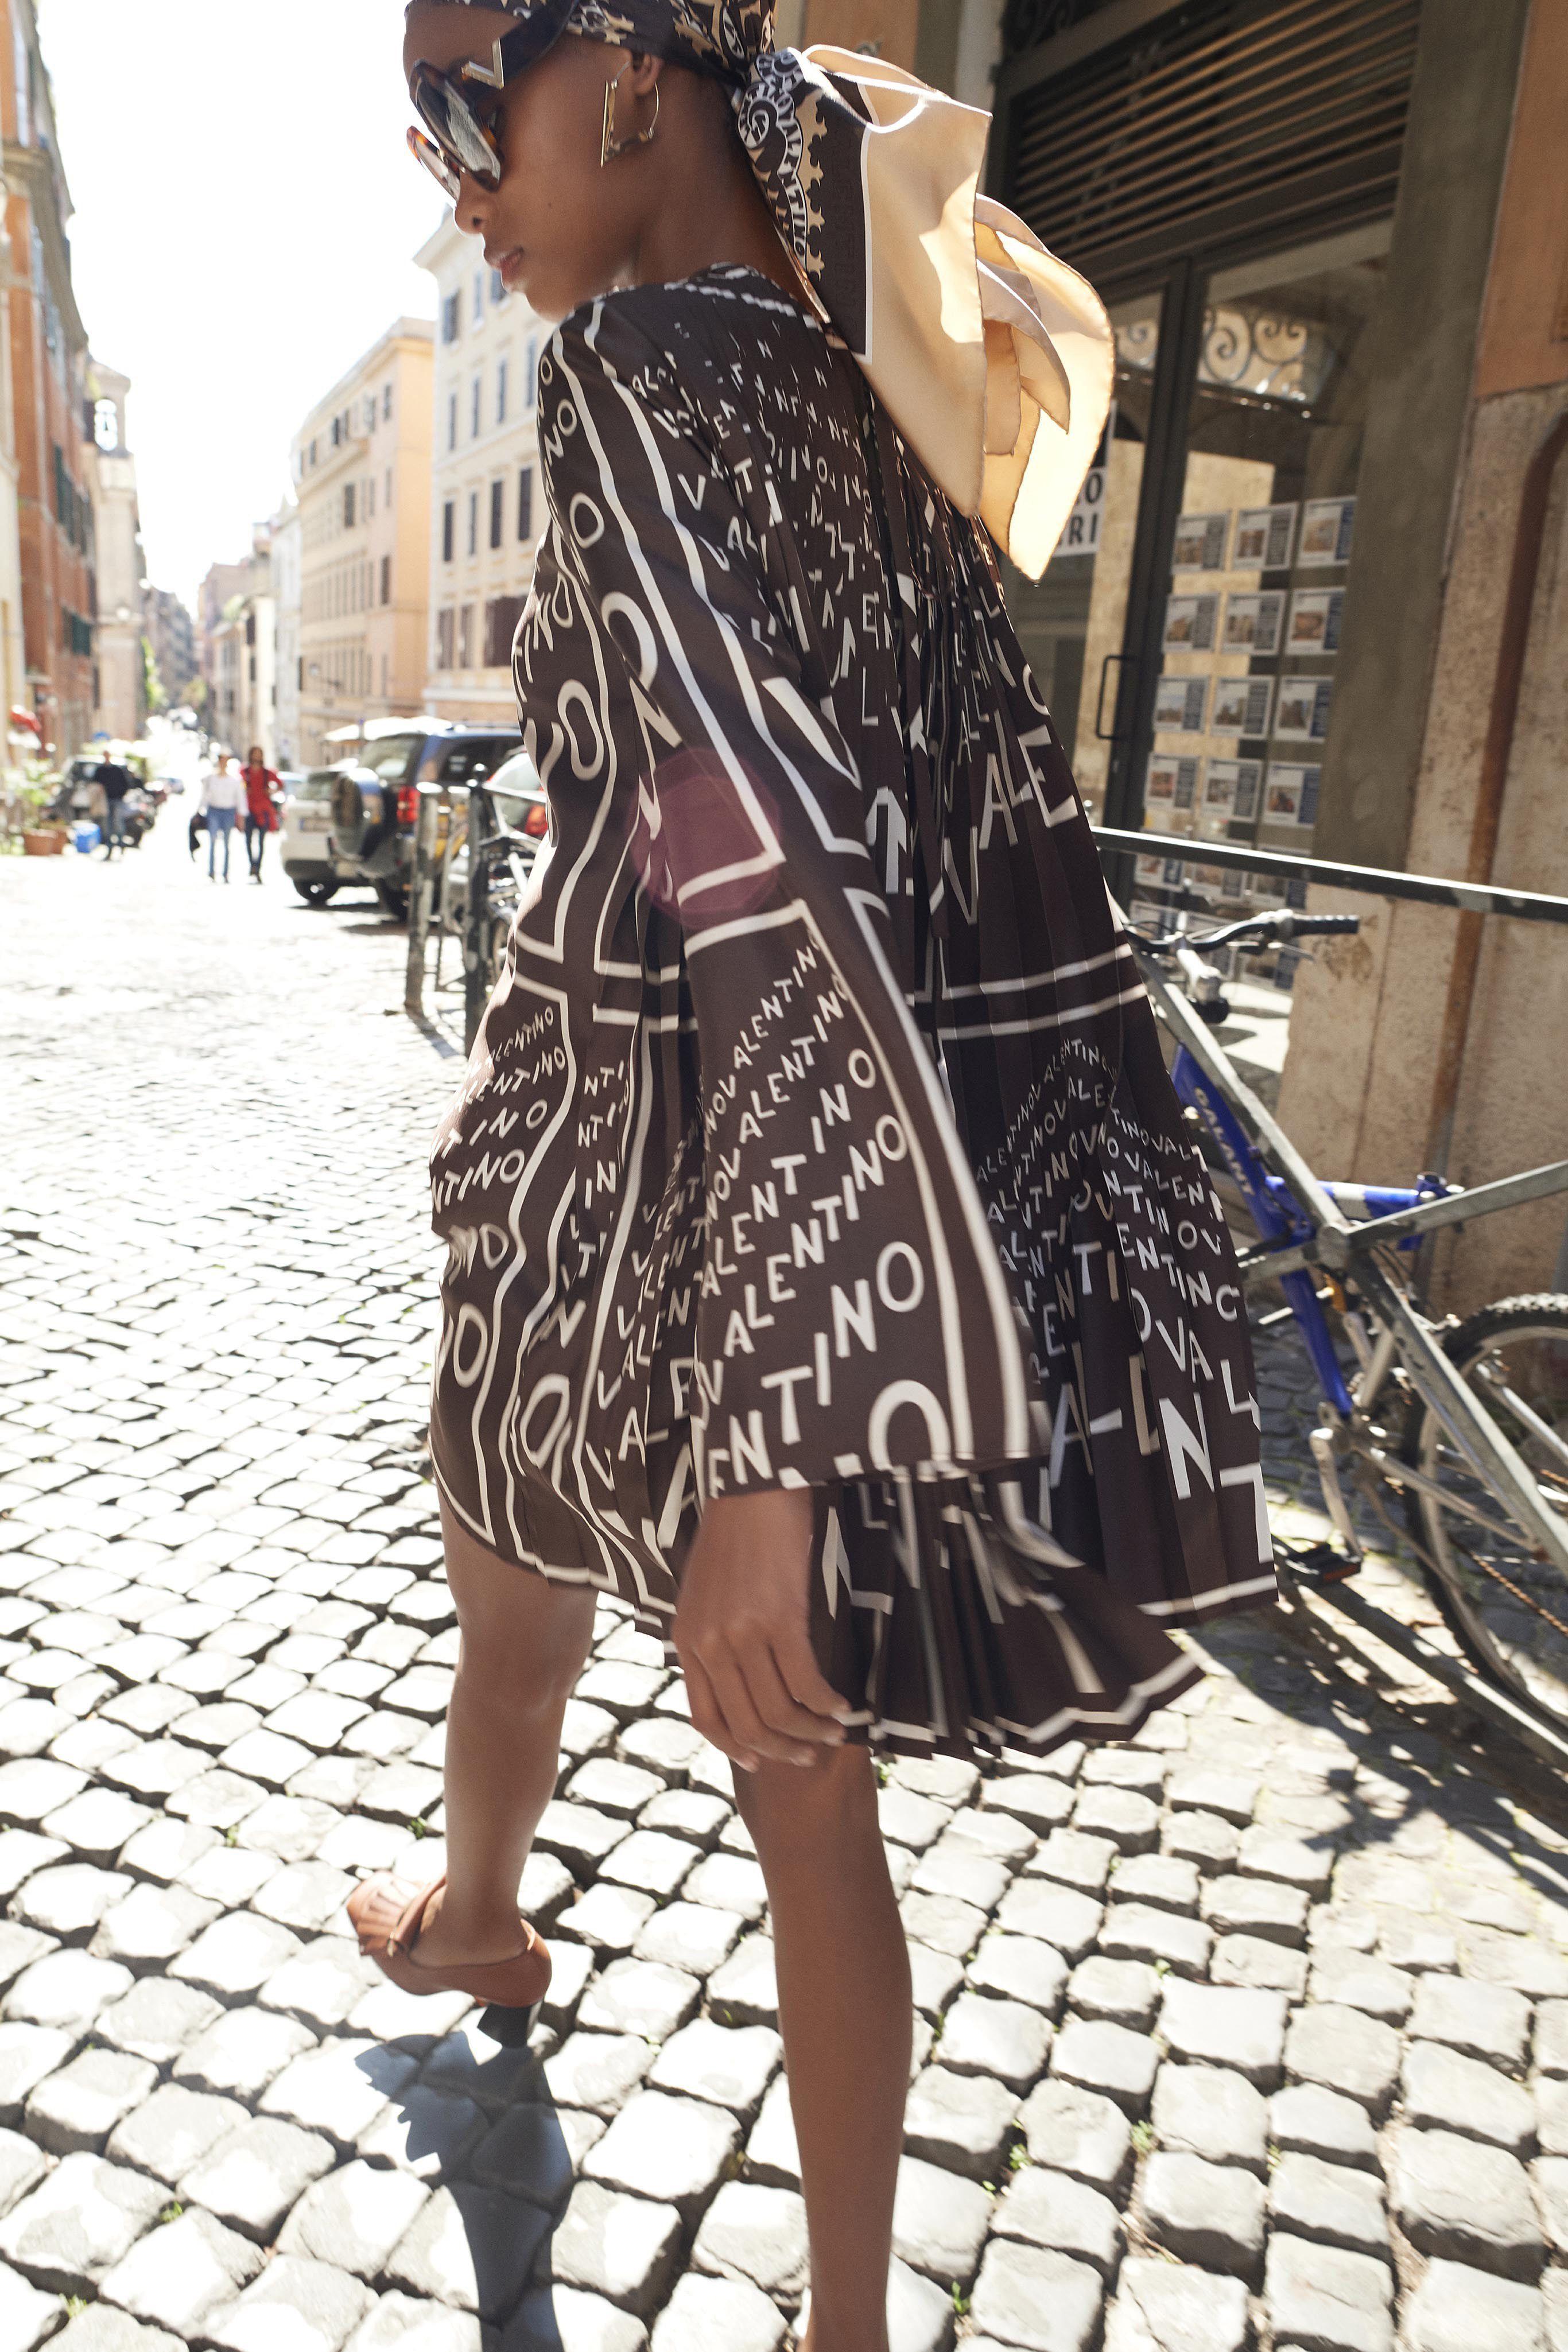 ba7515ee26d Valentino Resort 2019 Fashion Show Collection  See the complete Valentino  Resort 2019 collection. Look 30